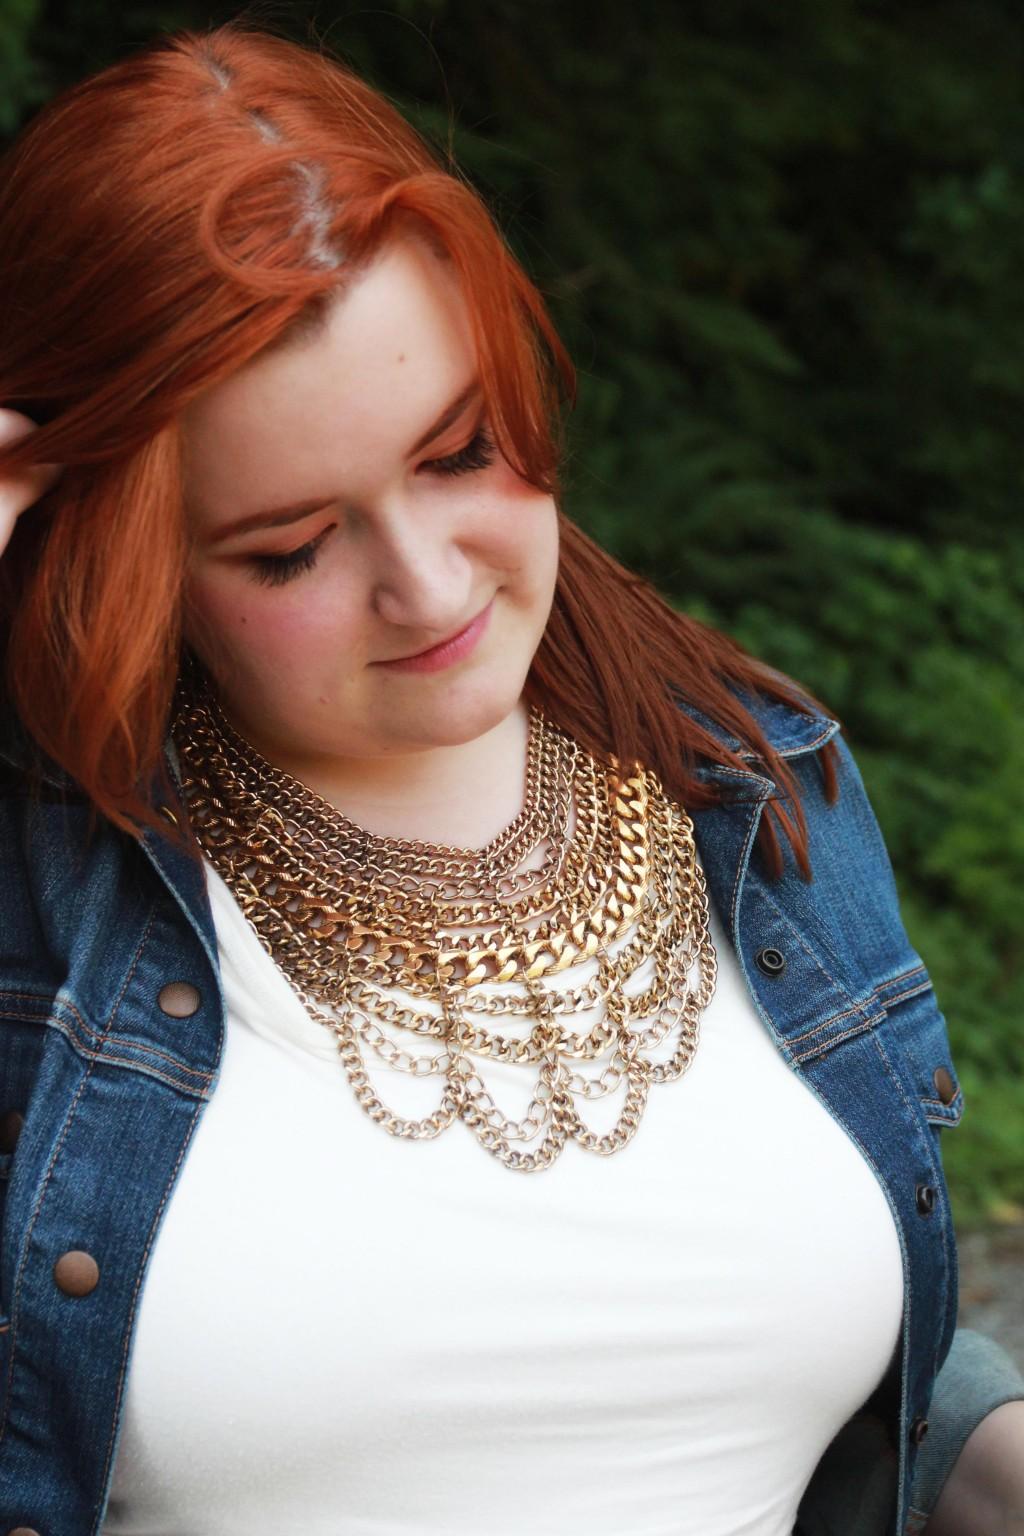 Redhead Fashion Blogger All Things Kate